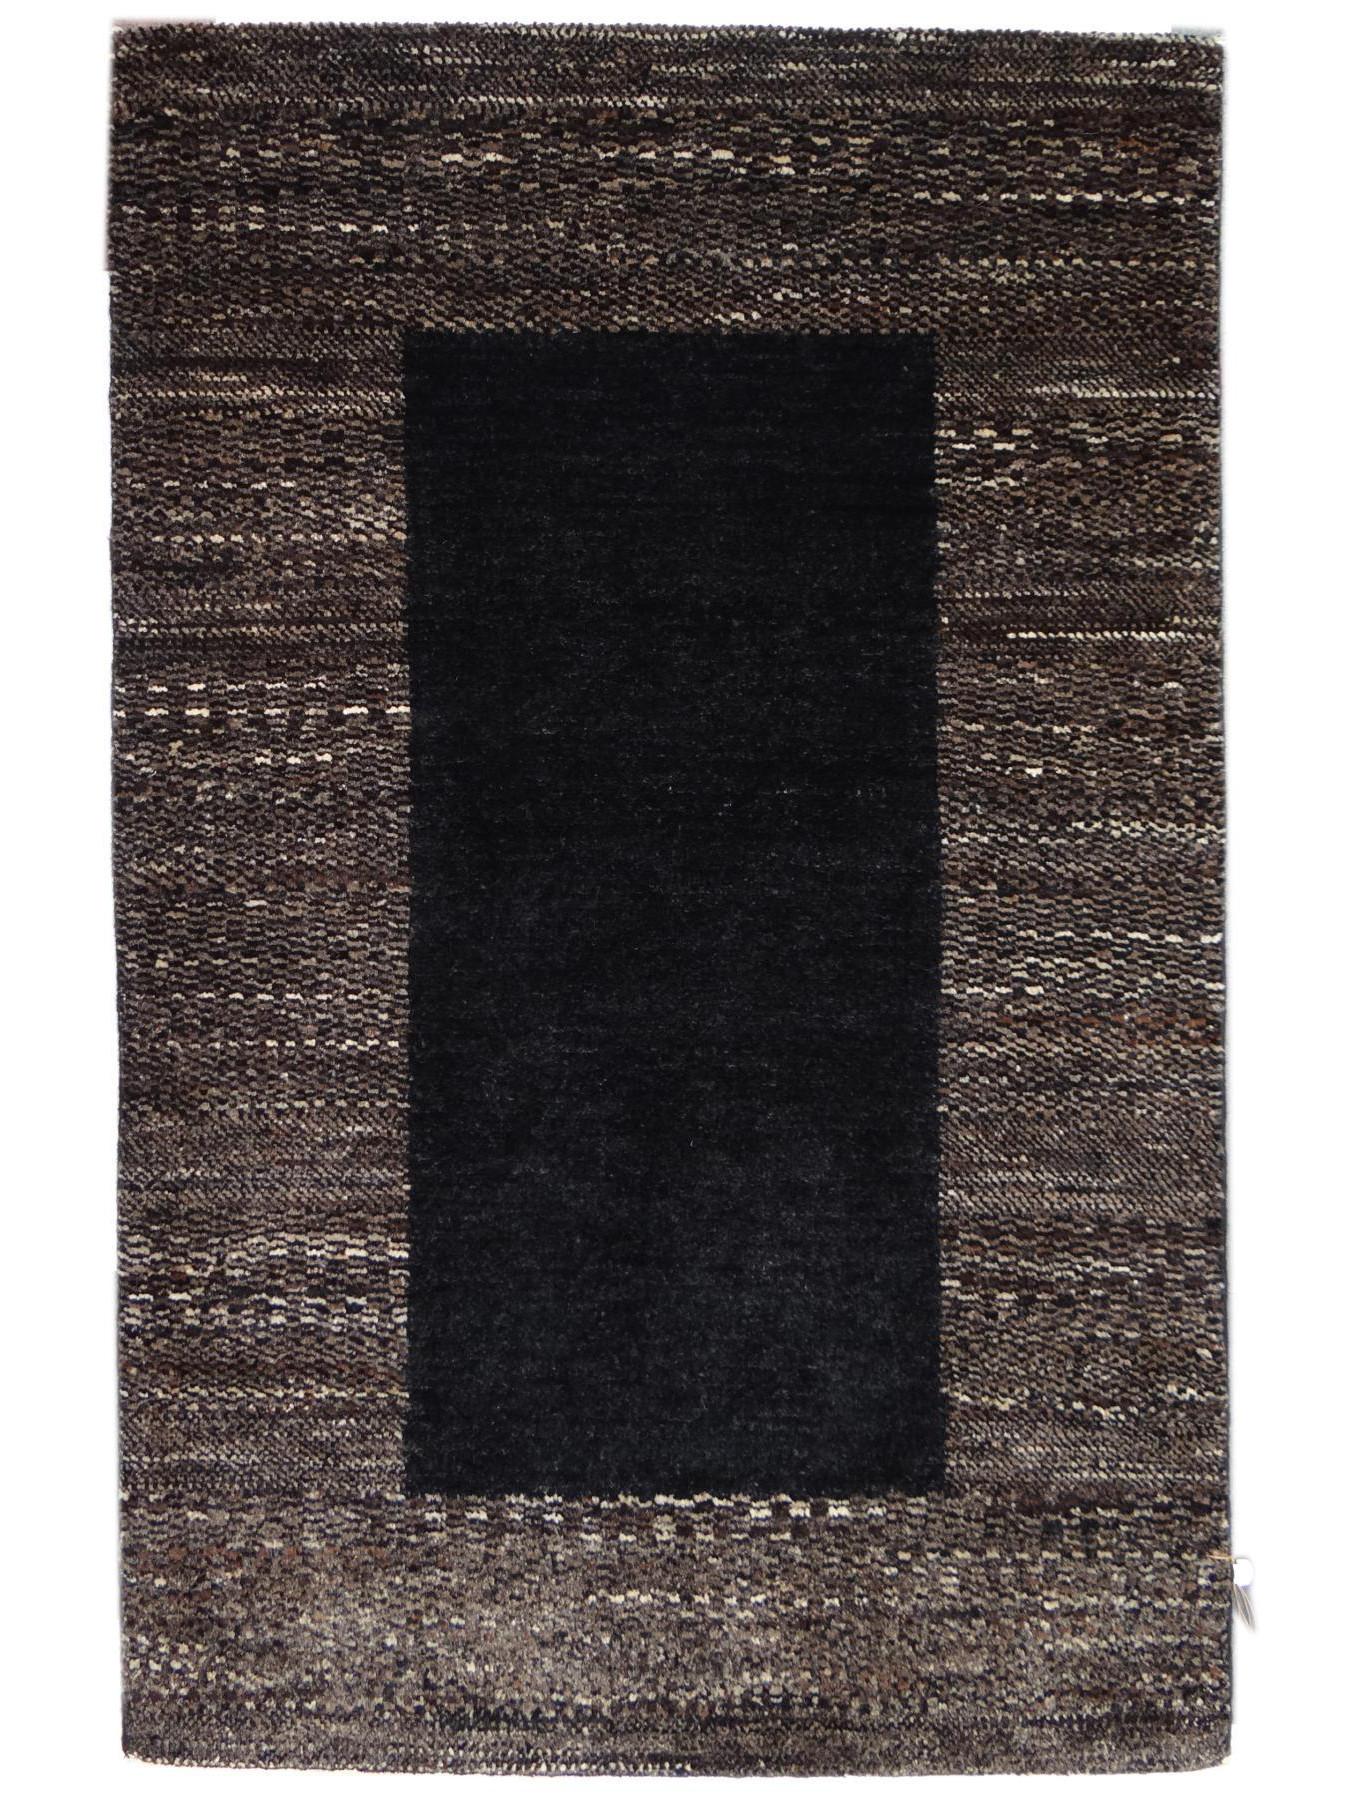 Ethnic carpets - TIMUR-EMOTION HNF024 1959